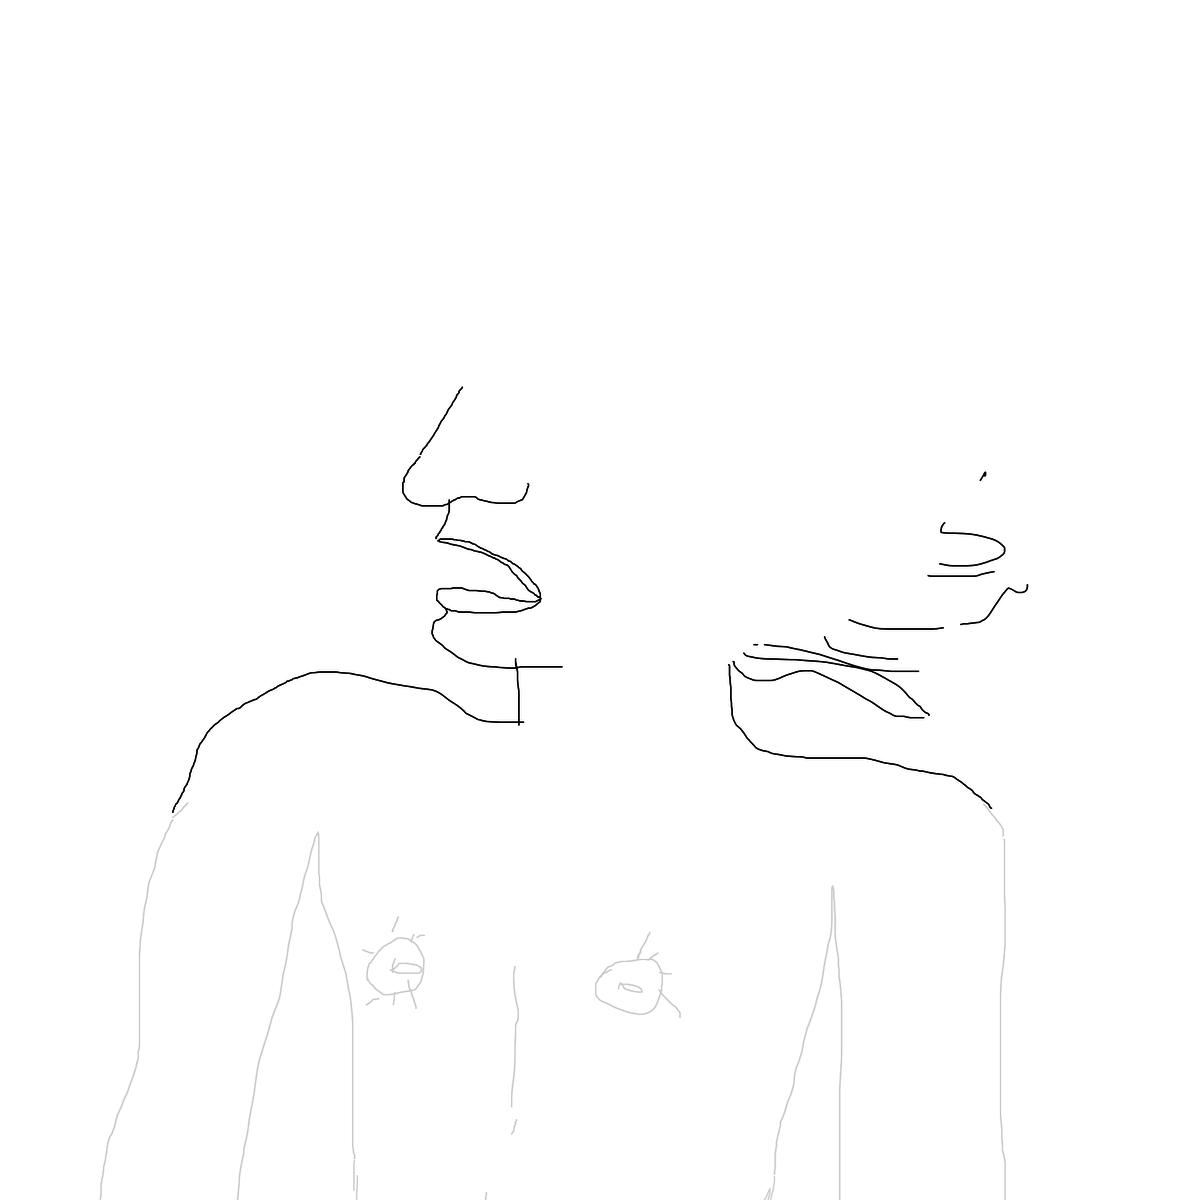 BAAAM drawing#9342 lat:63.4897956848144500lng: 26.3671989440917970